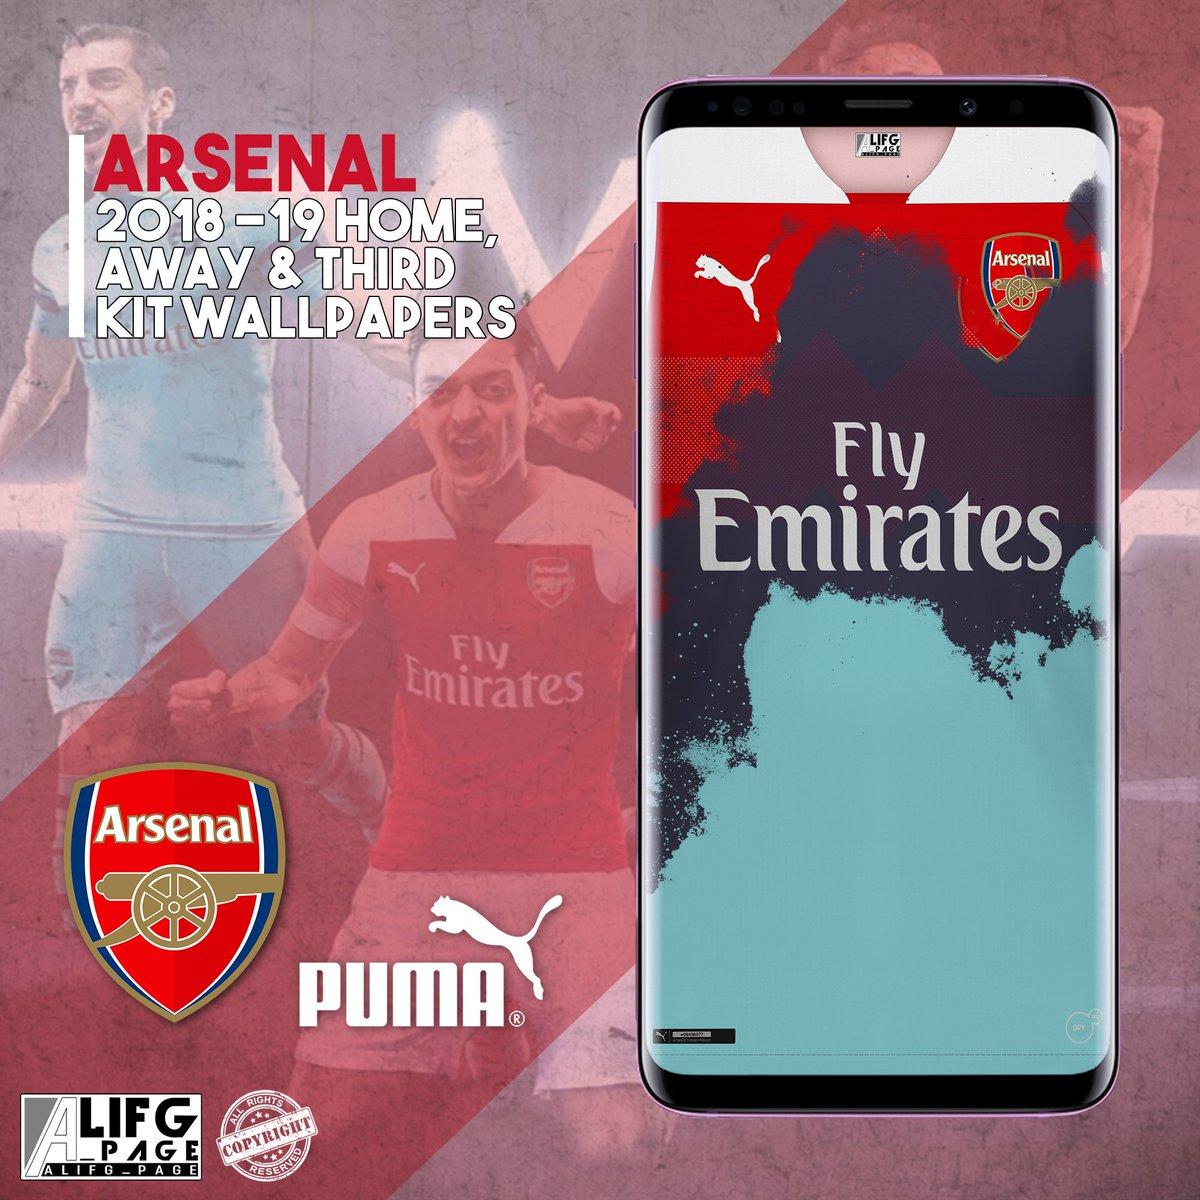 Ali Hajian On Twitter At Arsenal 2018 19 Home Away Third Kit